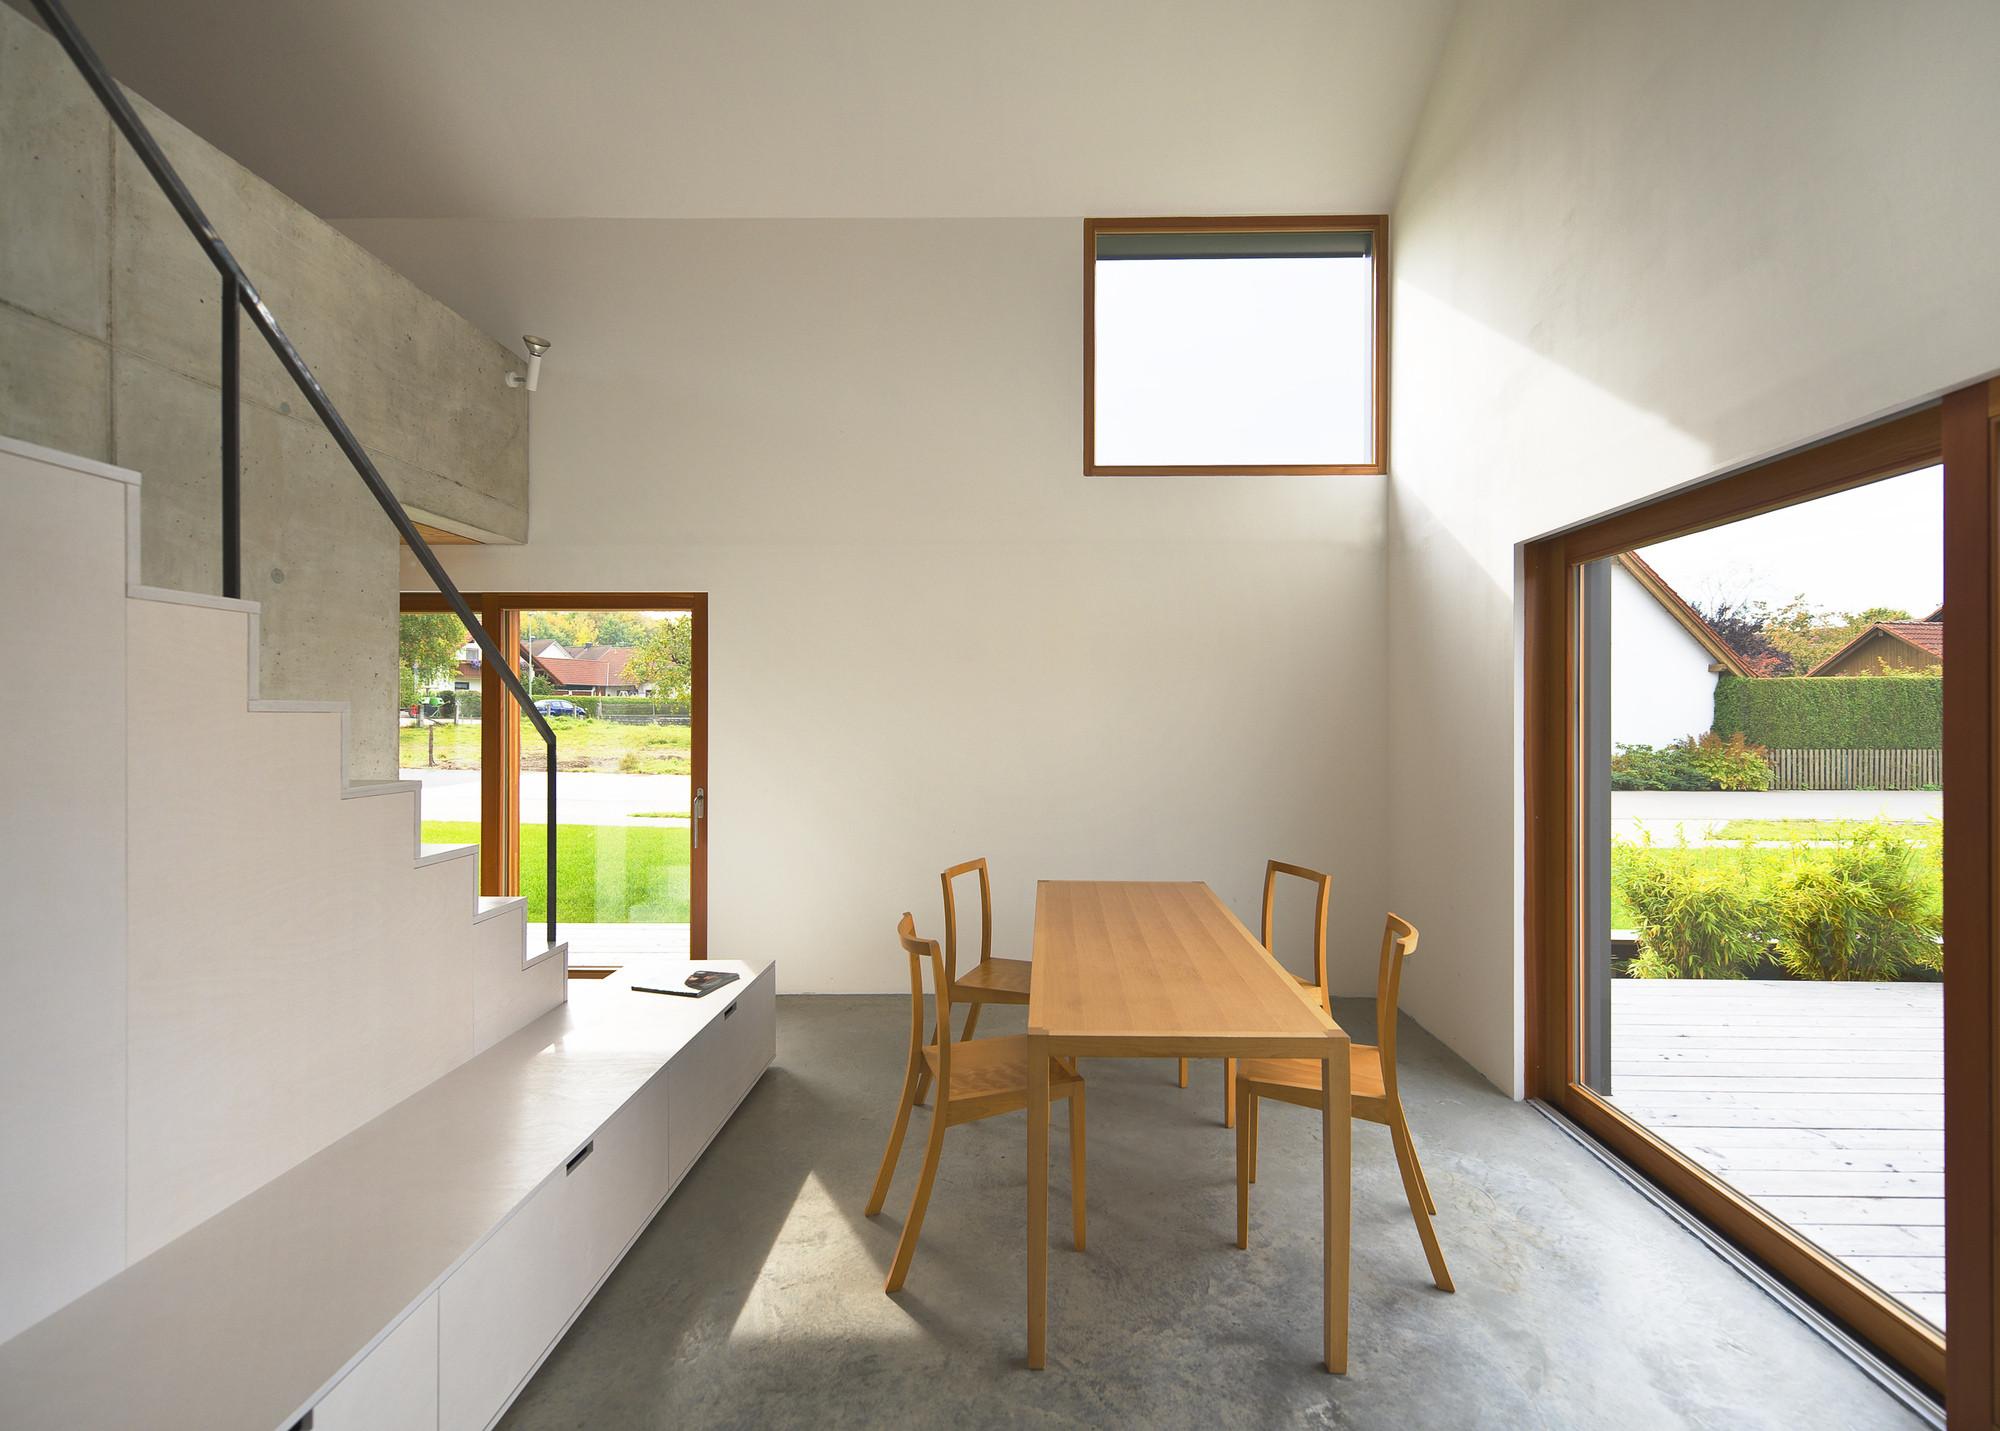 Haus bru soho architektur archdaily m xico for Architektur 4 1